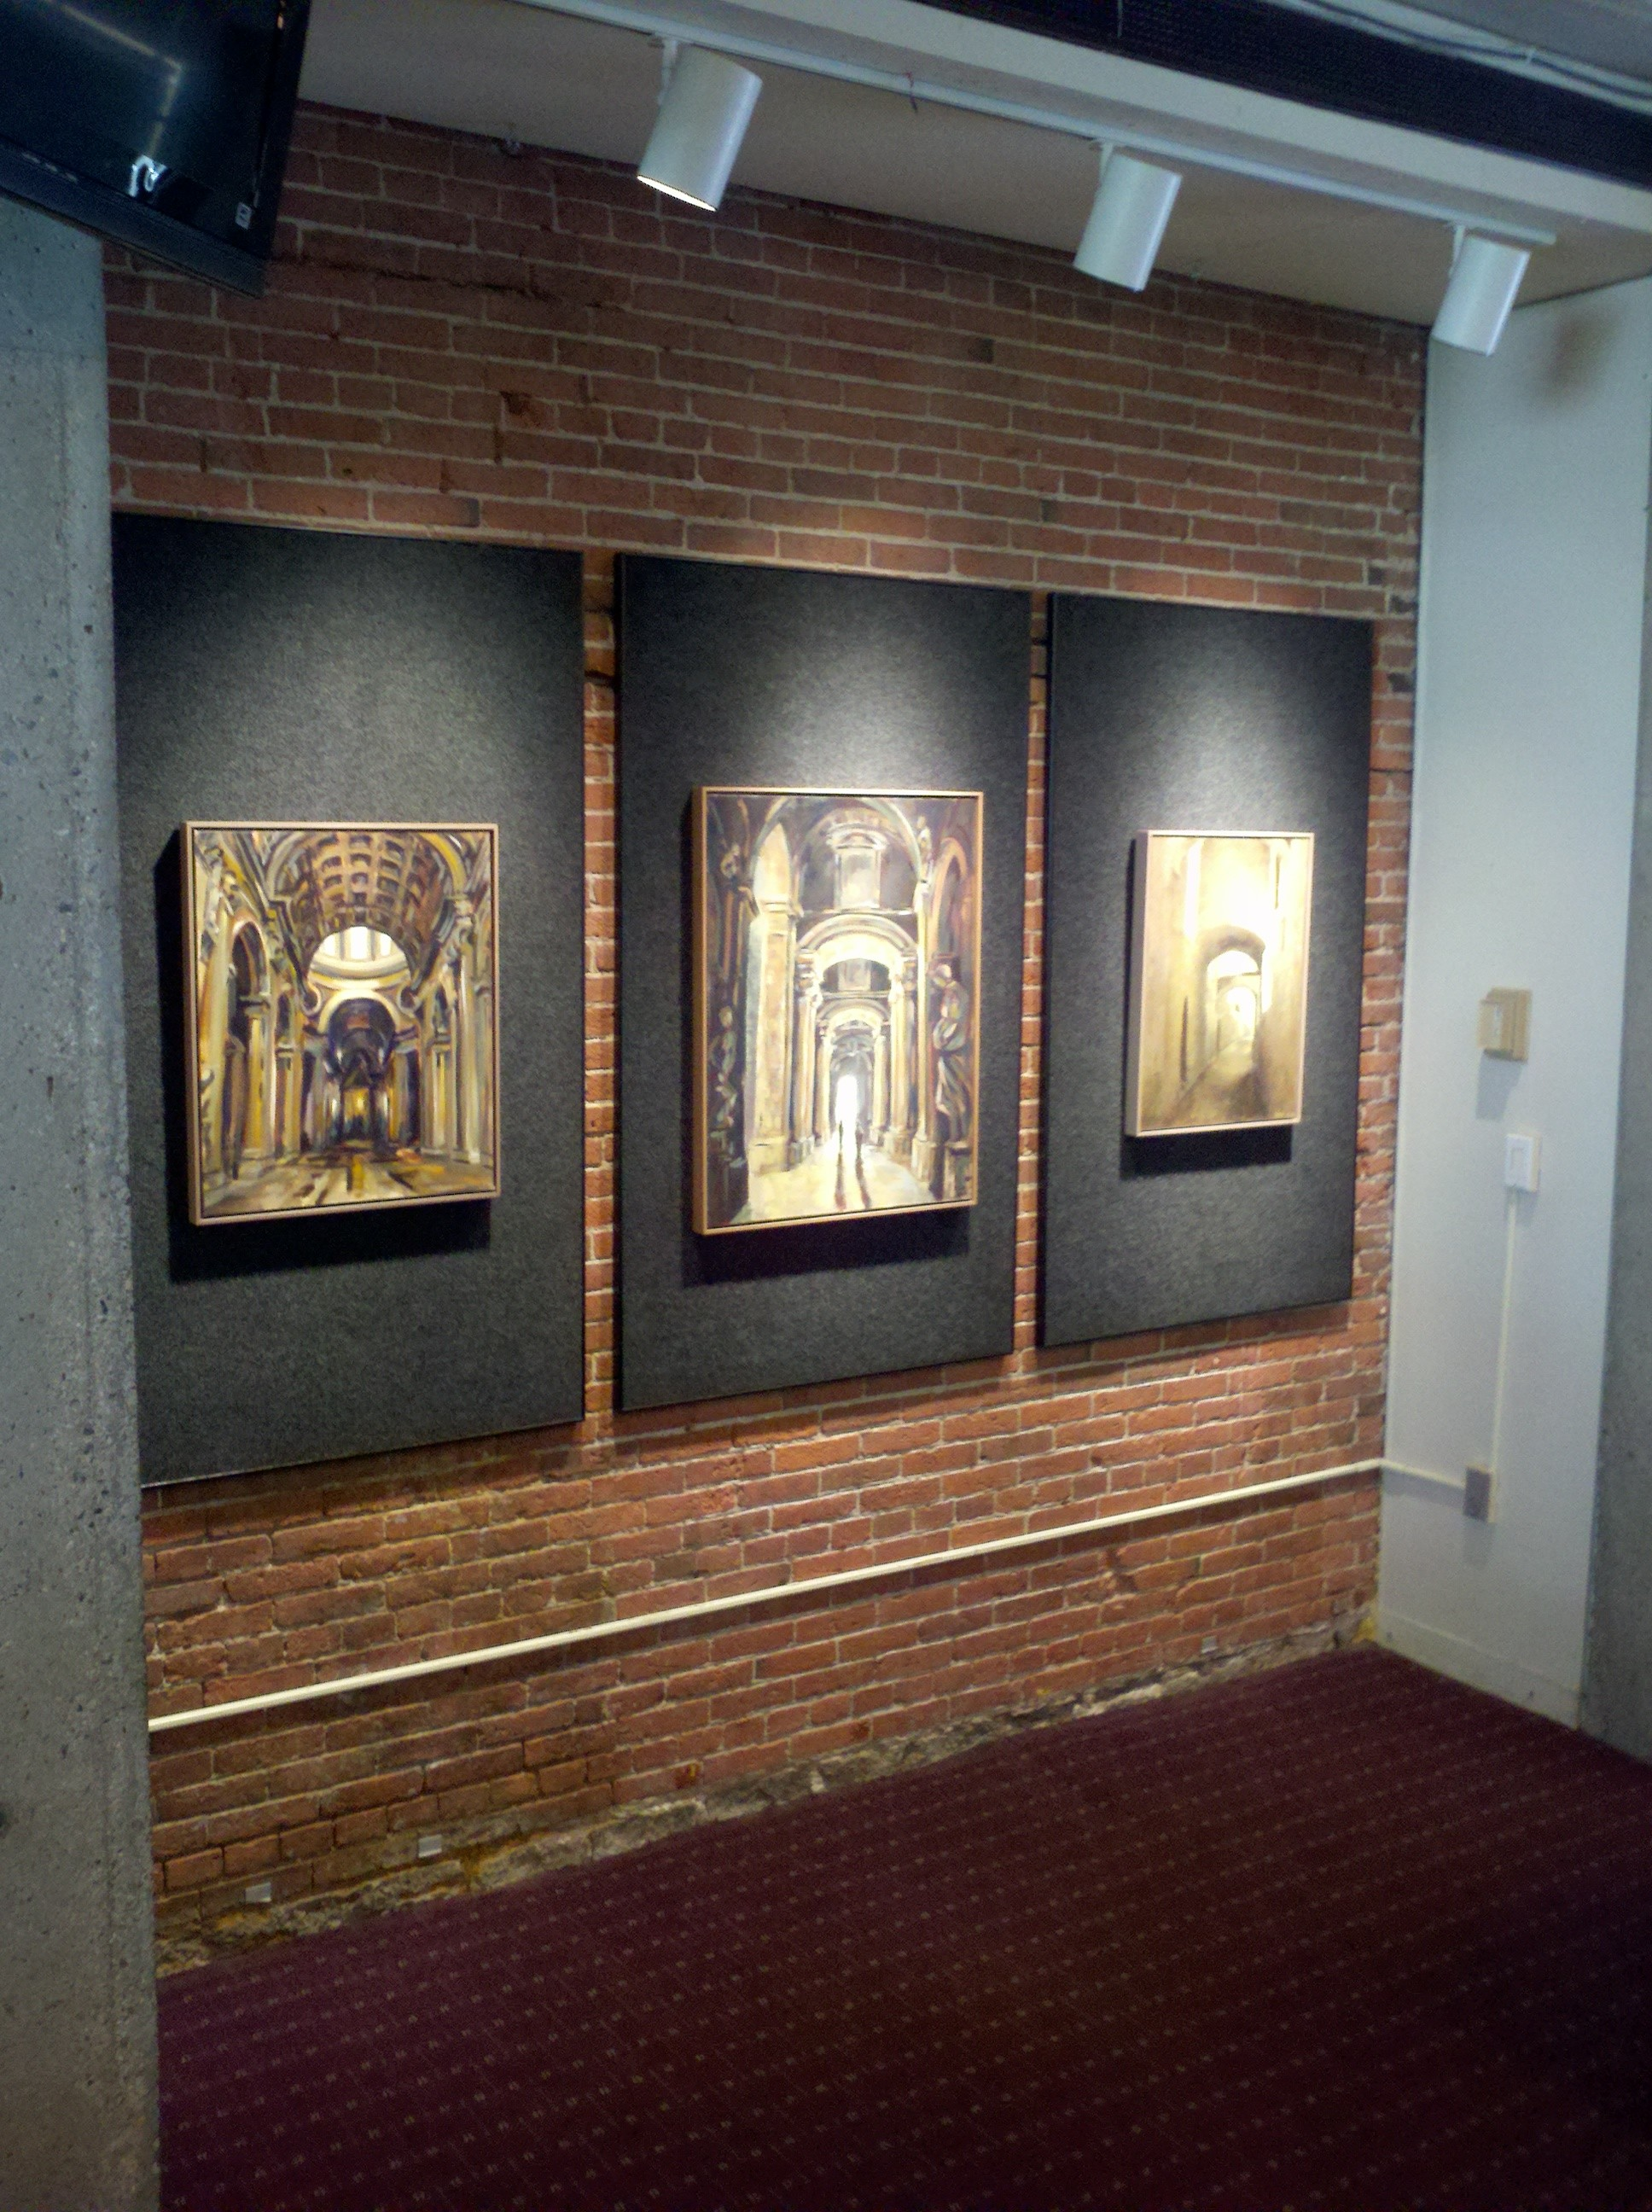 Park Street Arts Exhibit: Pilgrimage